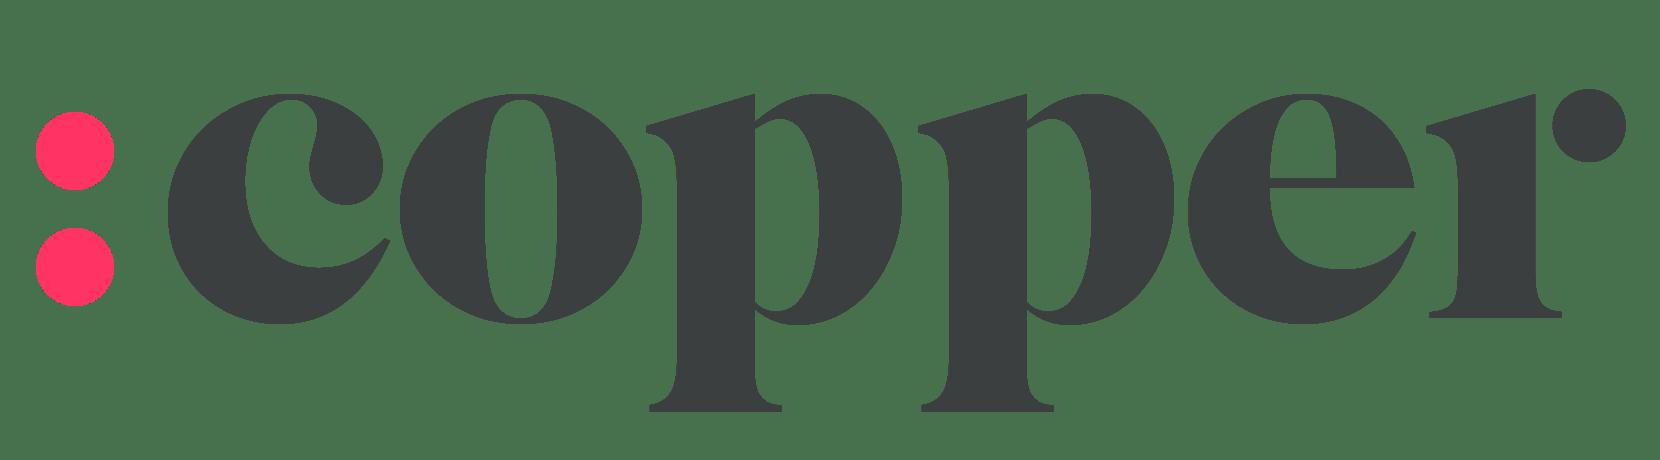 Copper integration logo